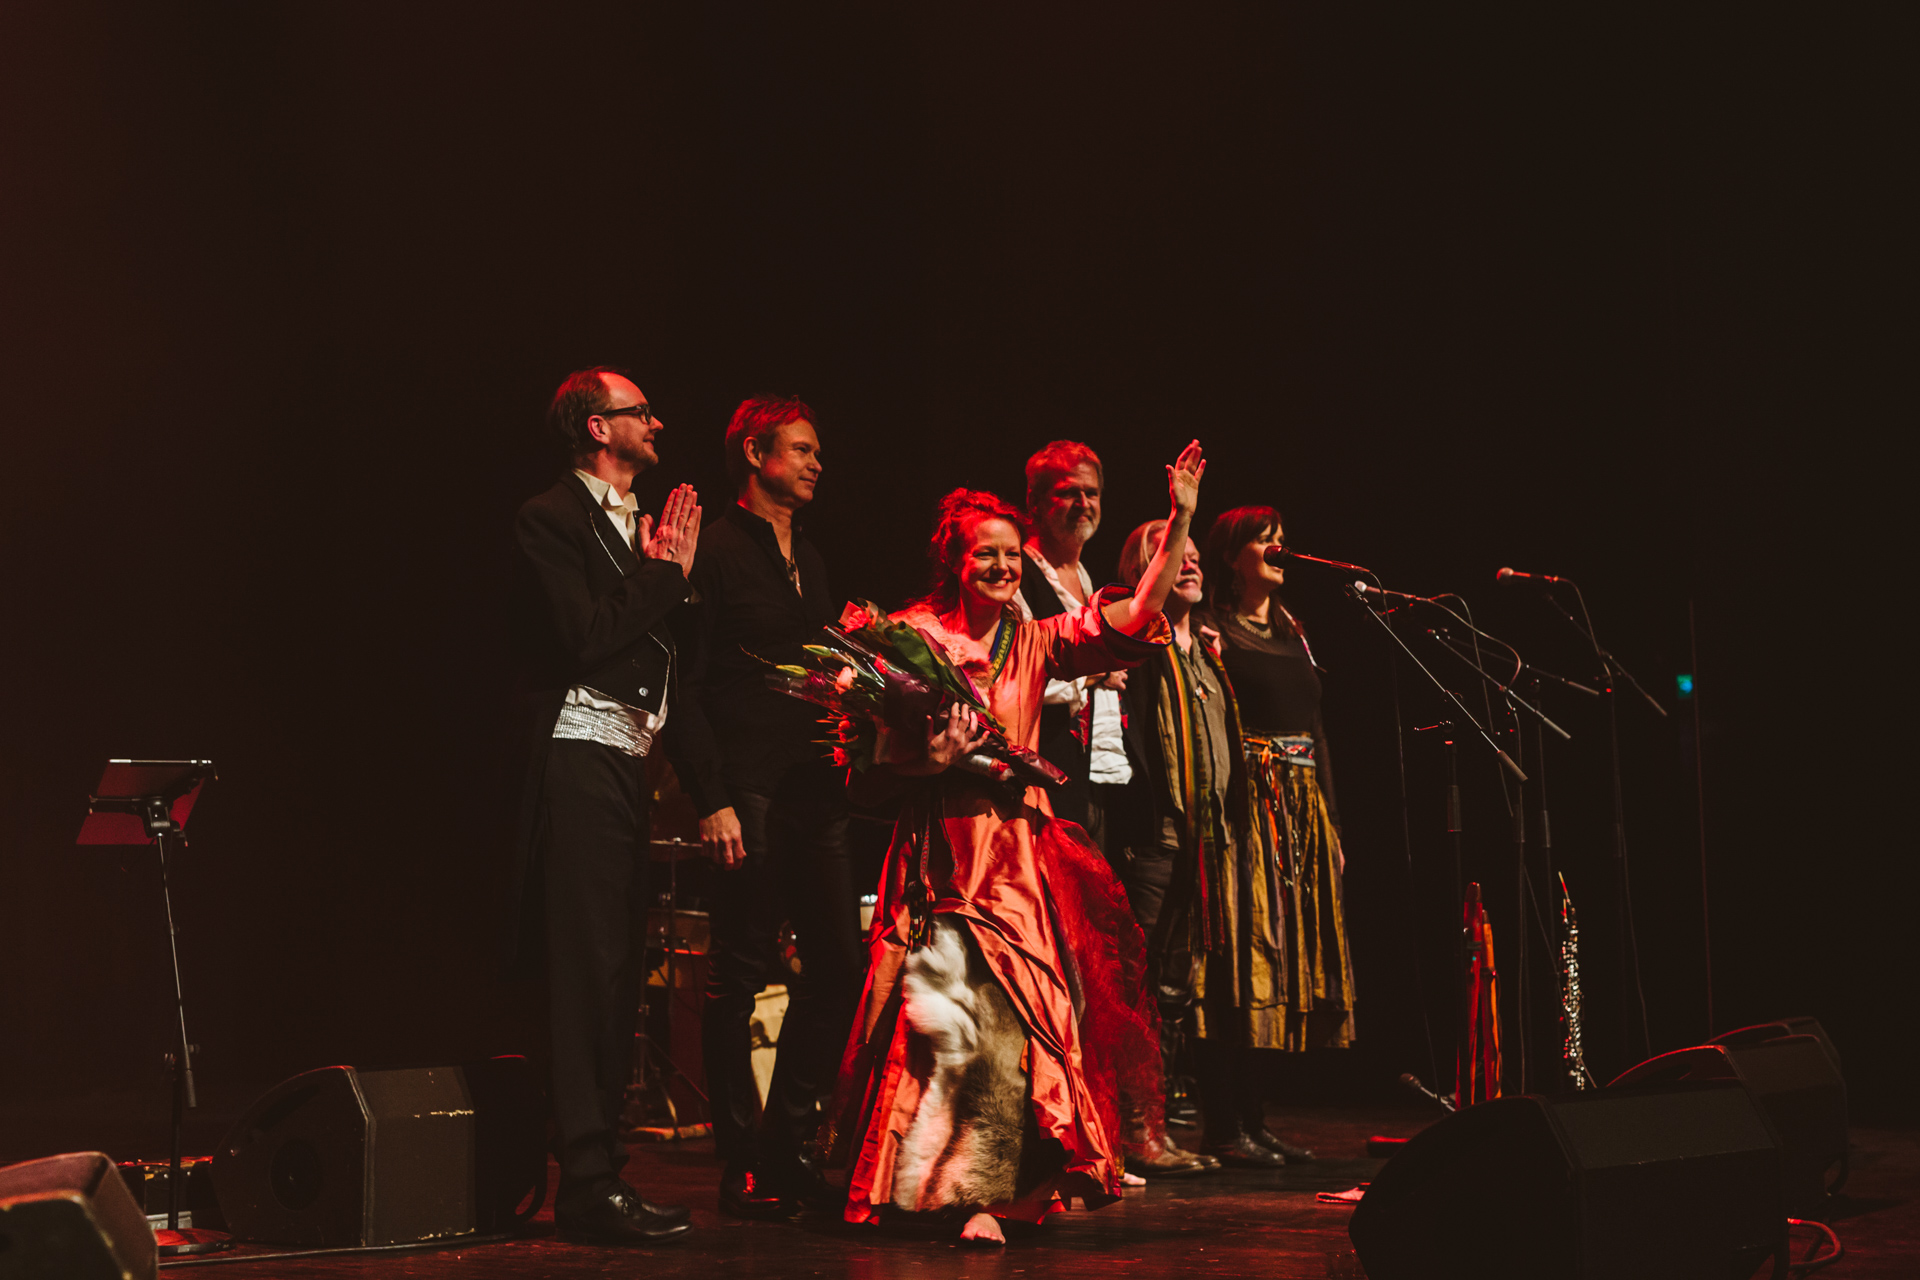 WEB-Elin-Teilus-concert-fotograf-Zita Marias-103.jpeg